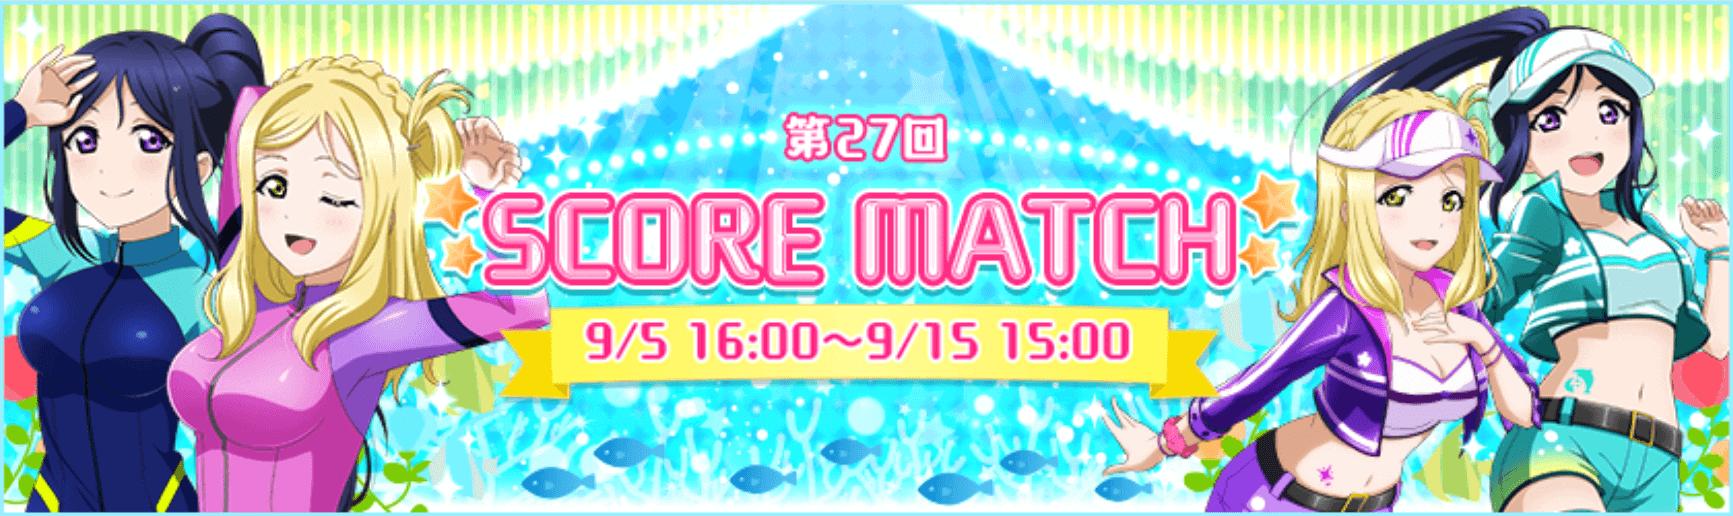 Score Match Round 27